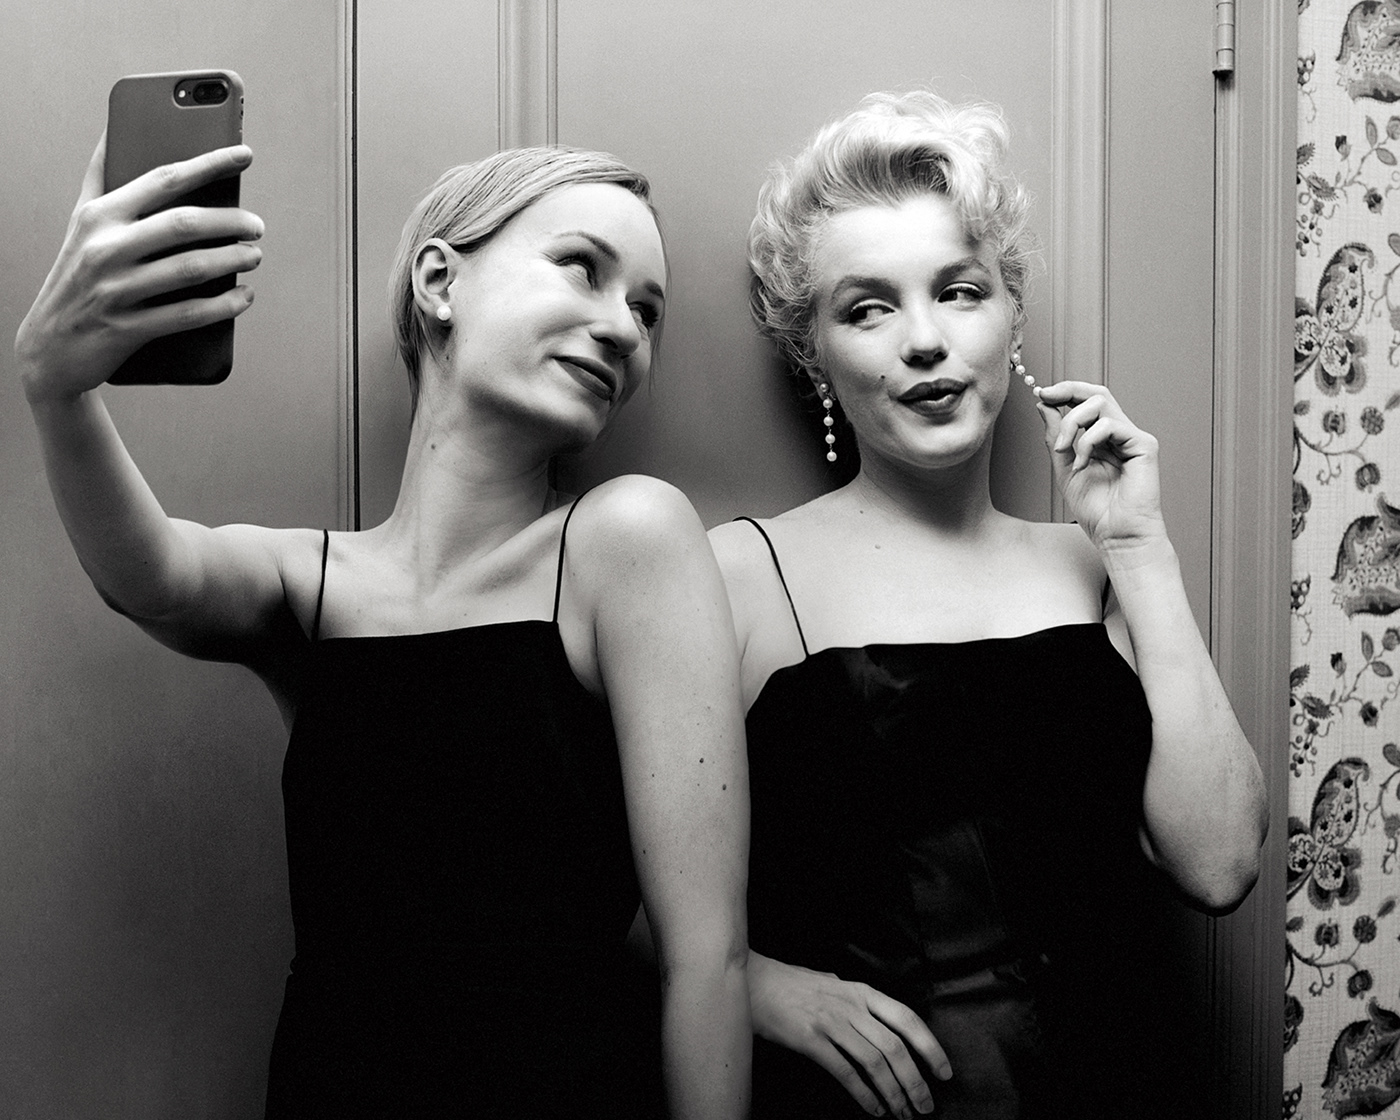 time travel photoshop photomanipulation selfie self portraits female artist conceptual